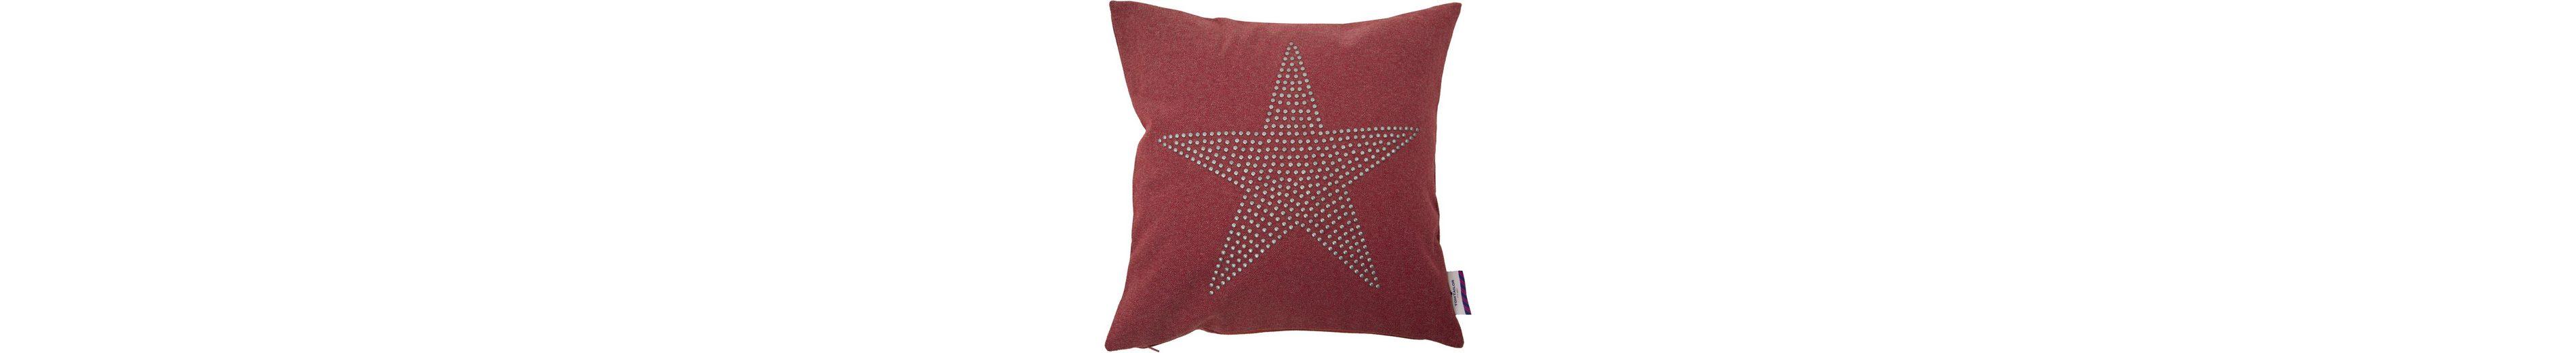 Kissenhüllen, Tom Tailor, »RIVITED STAR« (1 Stück)